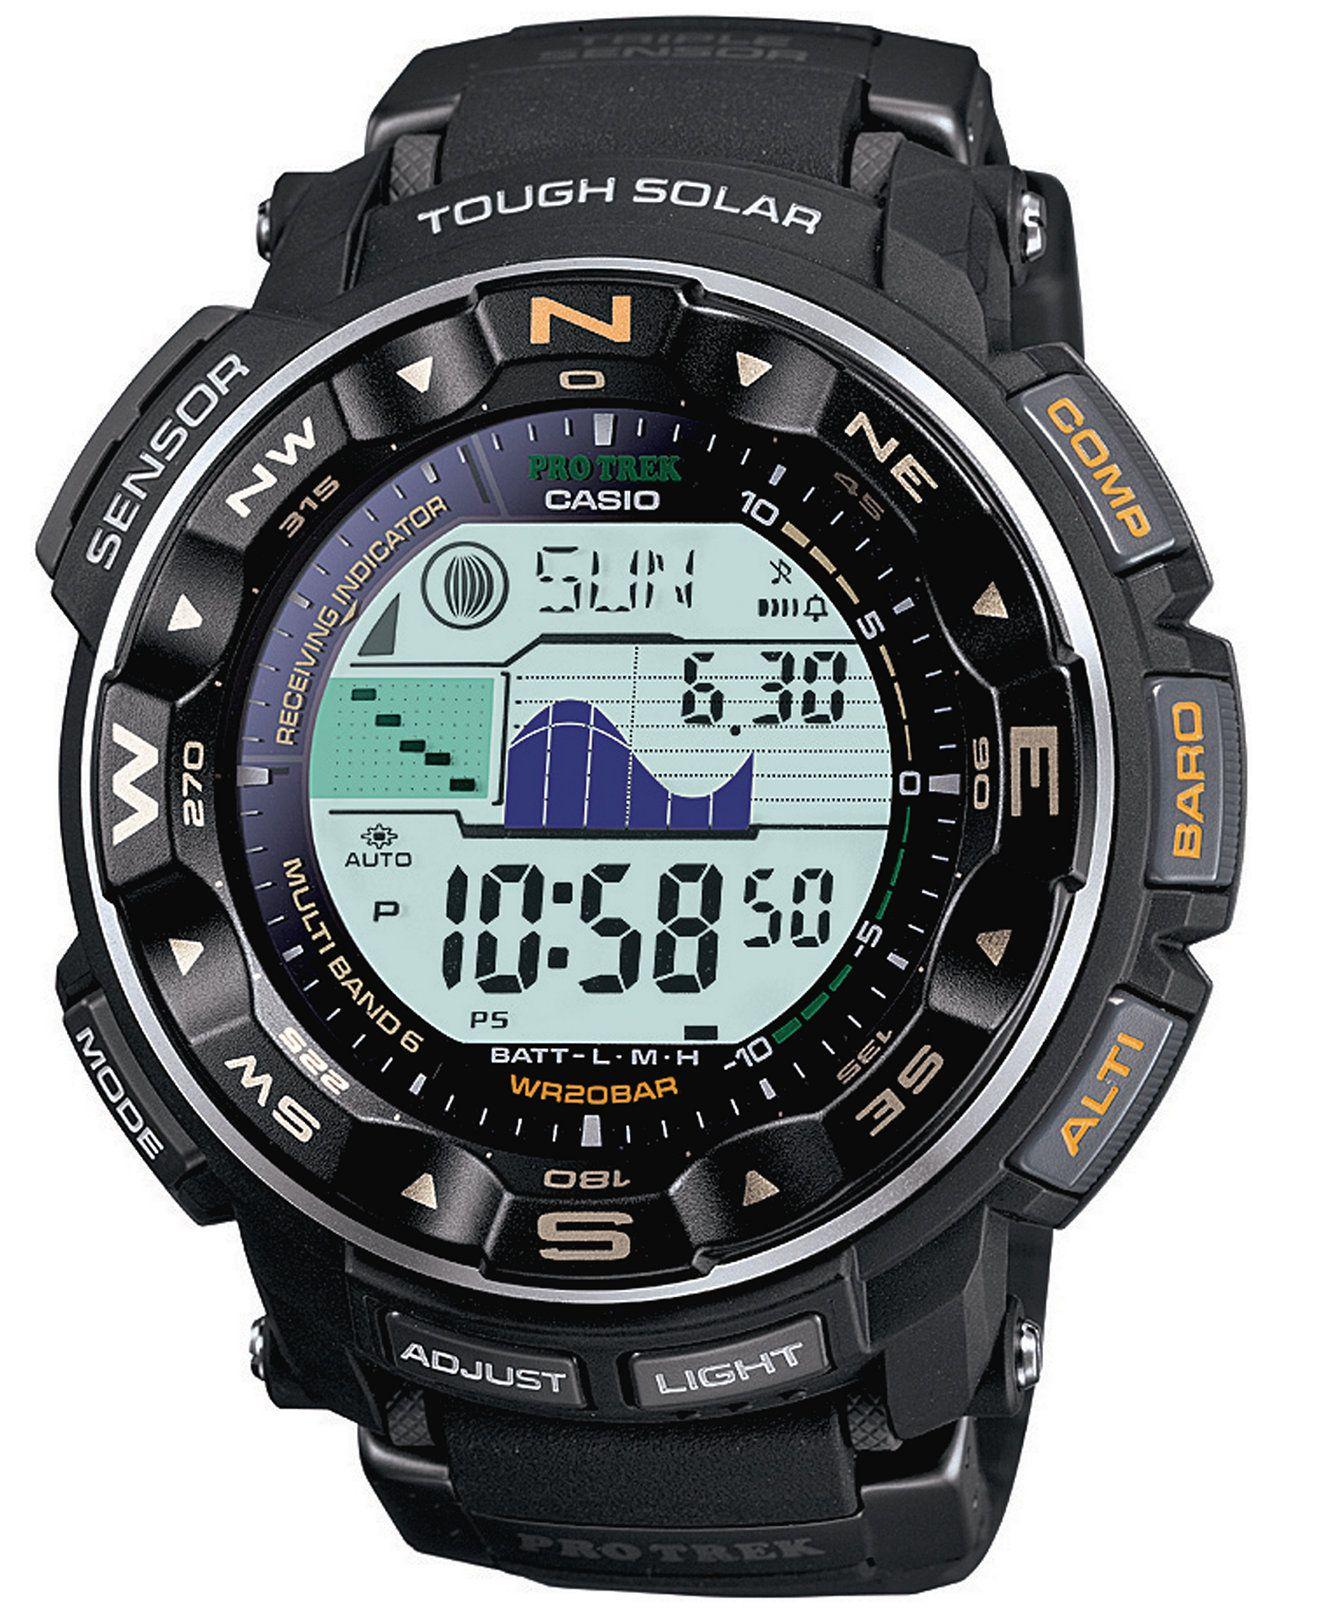 c4e9b51b725 G-Shock Men s Digital Pathfinder Black Resin Bracelet Watch PRW2500-1 - w  moon phases